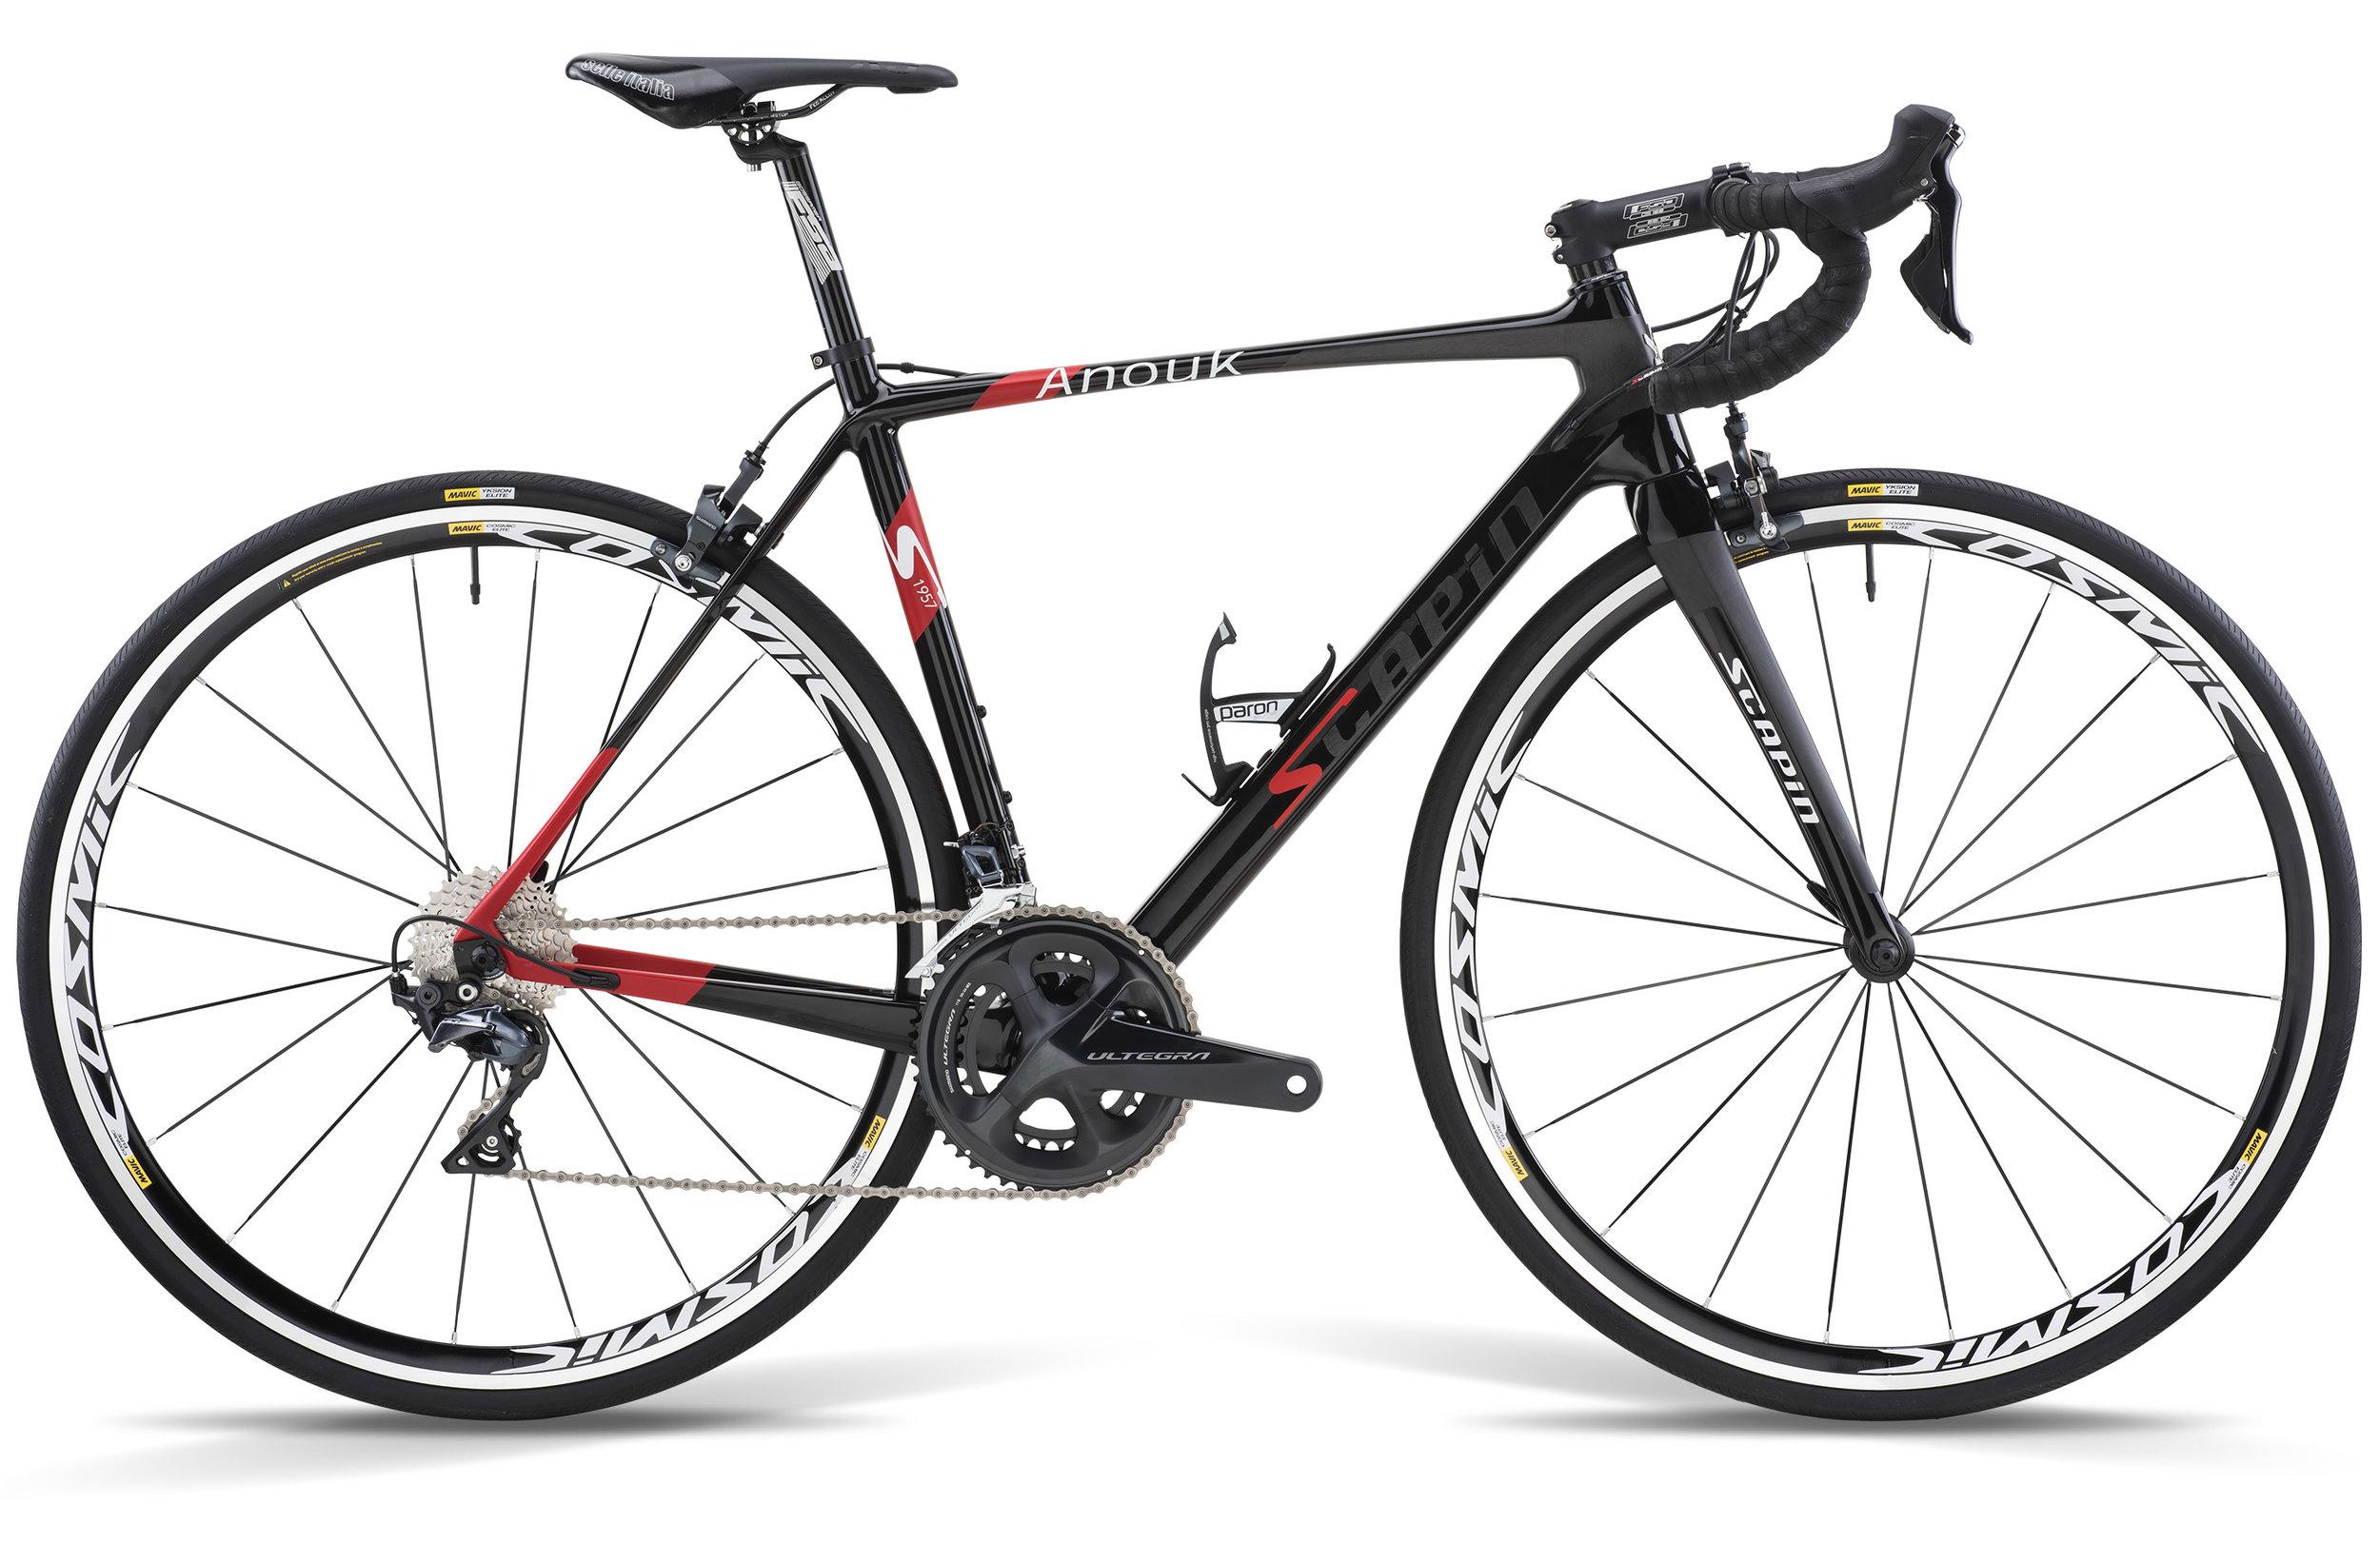 Rennrad SCAPIN ANOUK (Carbon/Shimano 105 7000) - 2018 (L, XL, XXL)